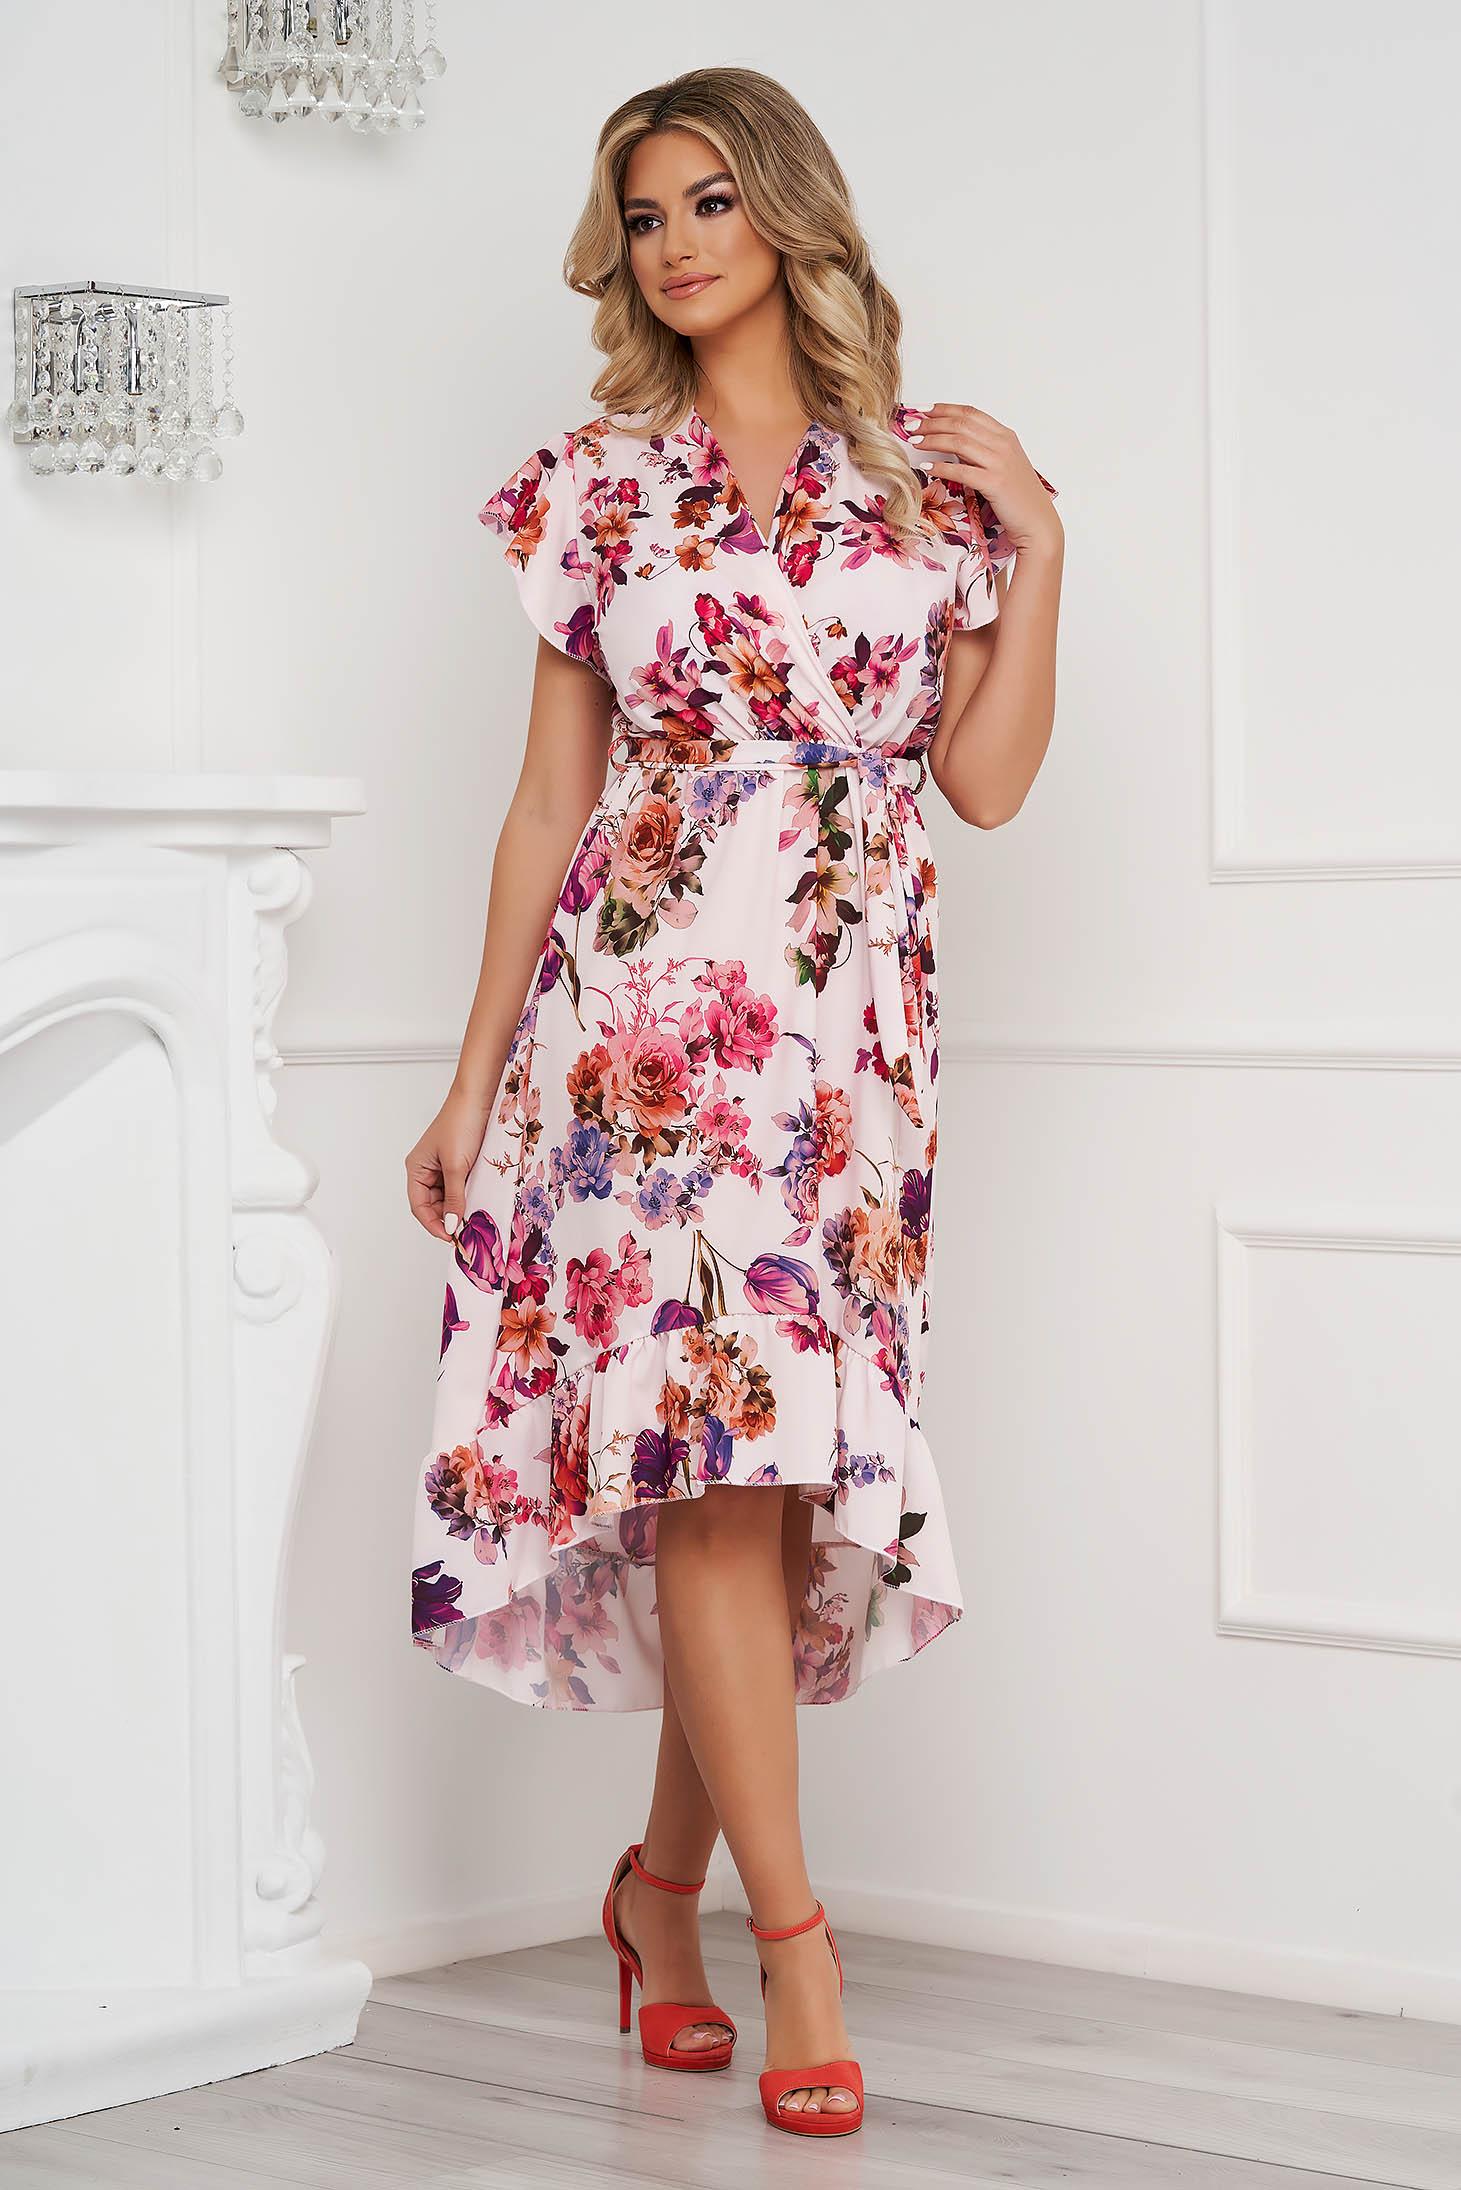 Dress midi asymmetrical cloche with elastic waist with floral print